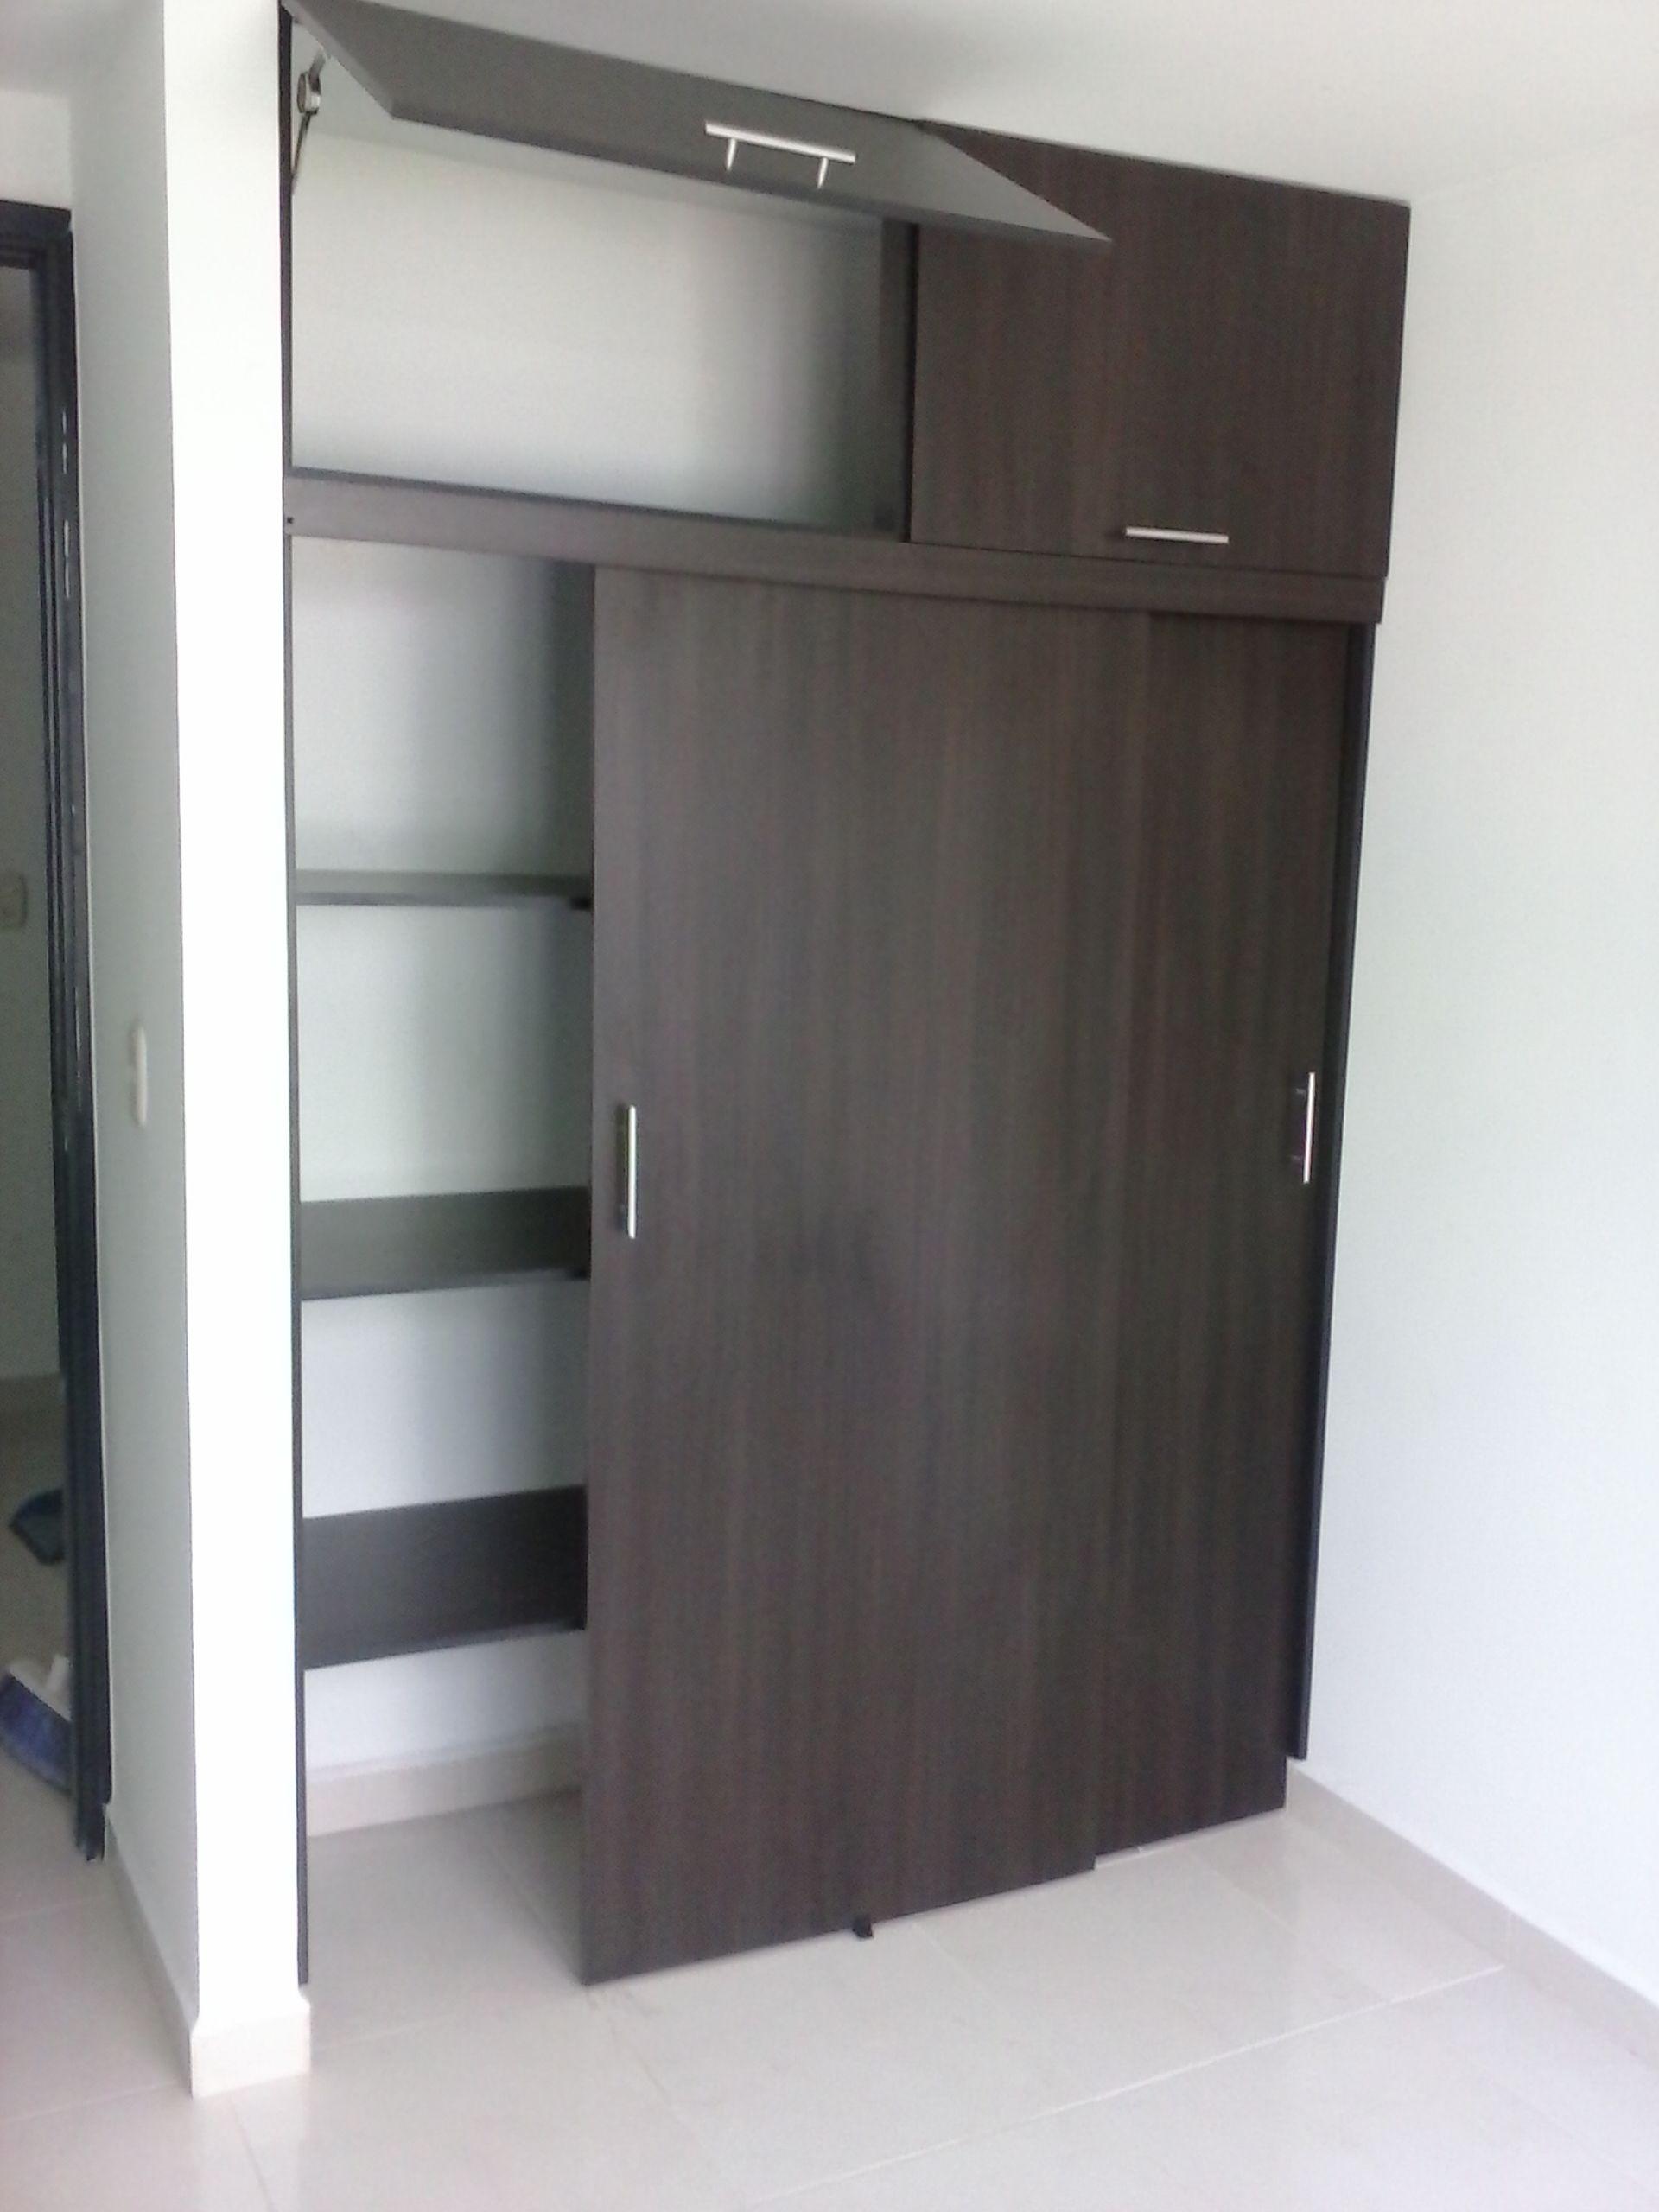 clothes closet organizer armoire systems solutions design ideas hanging furniture storage wardrobe